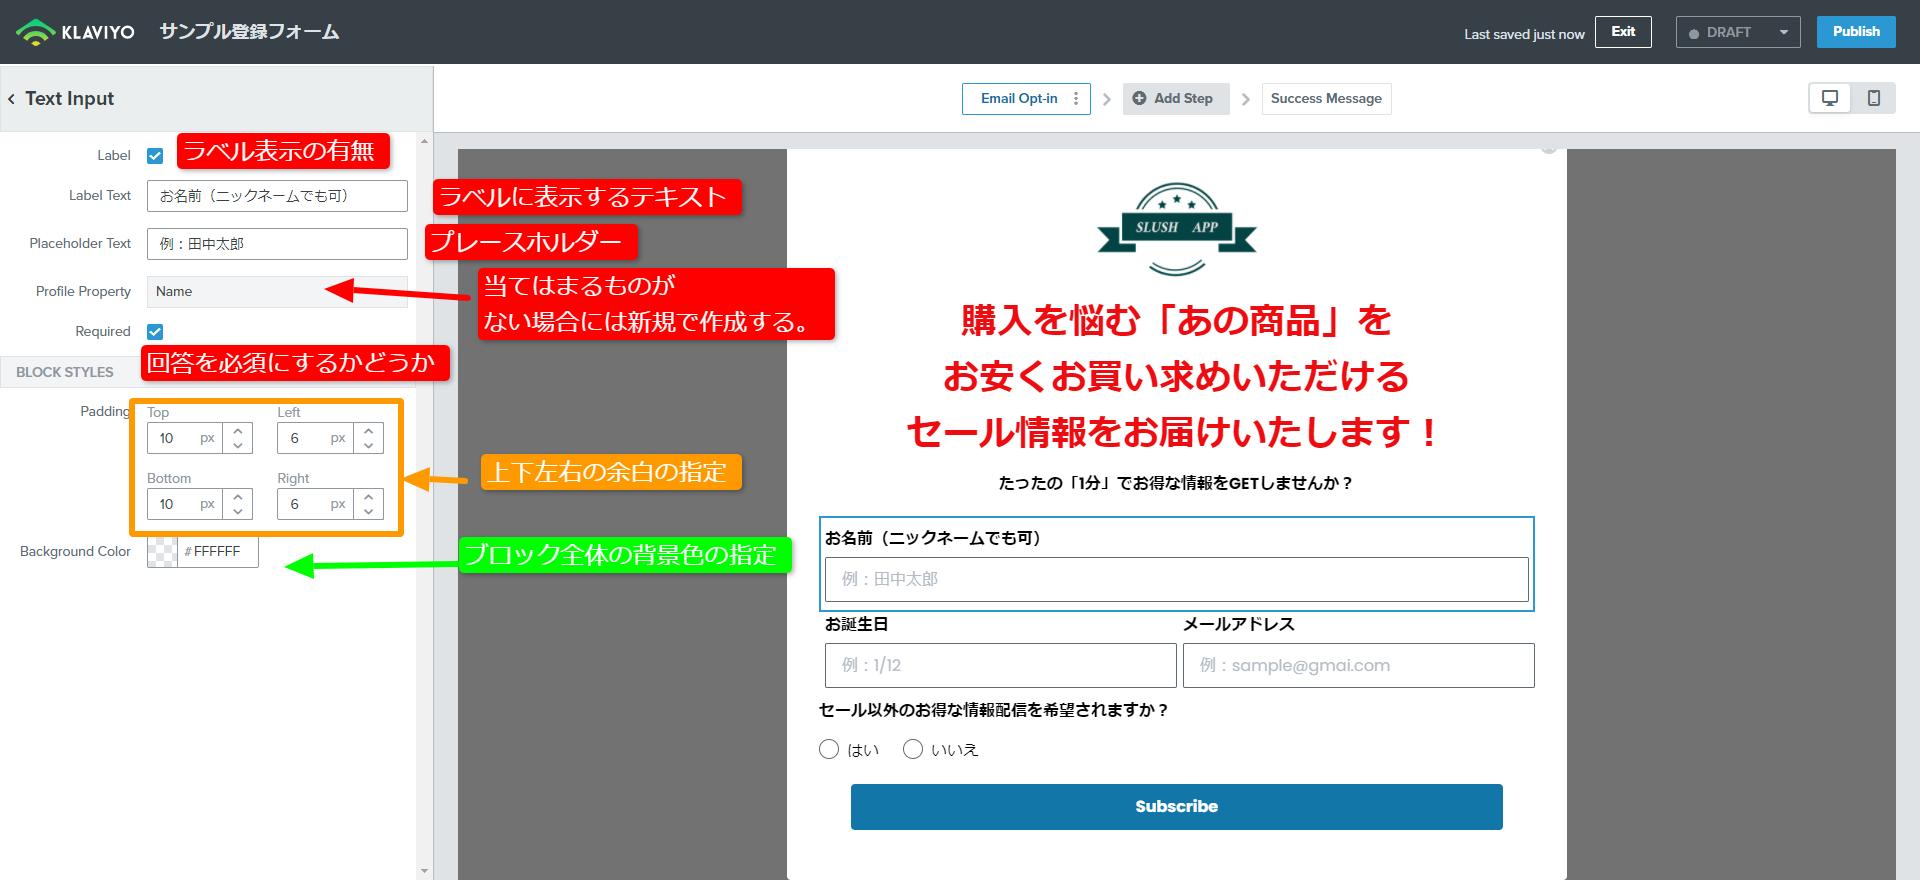 Klaviyo: Email Marketing & SMSのフォームに要素を追加する手順